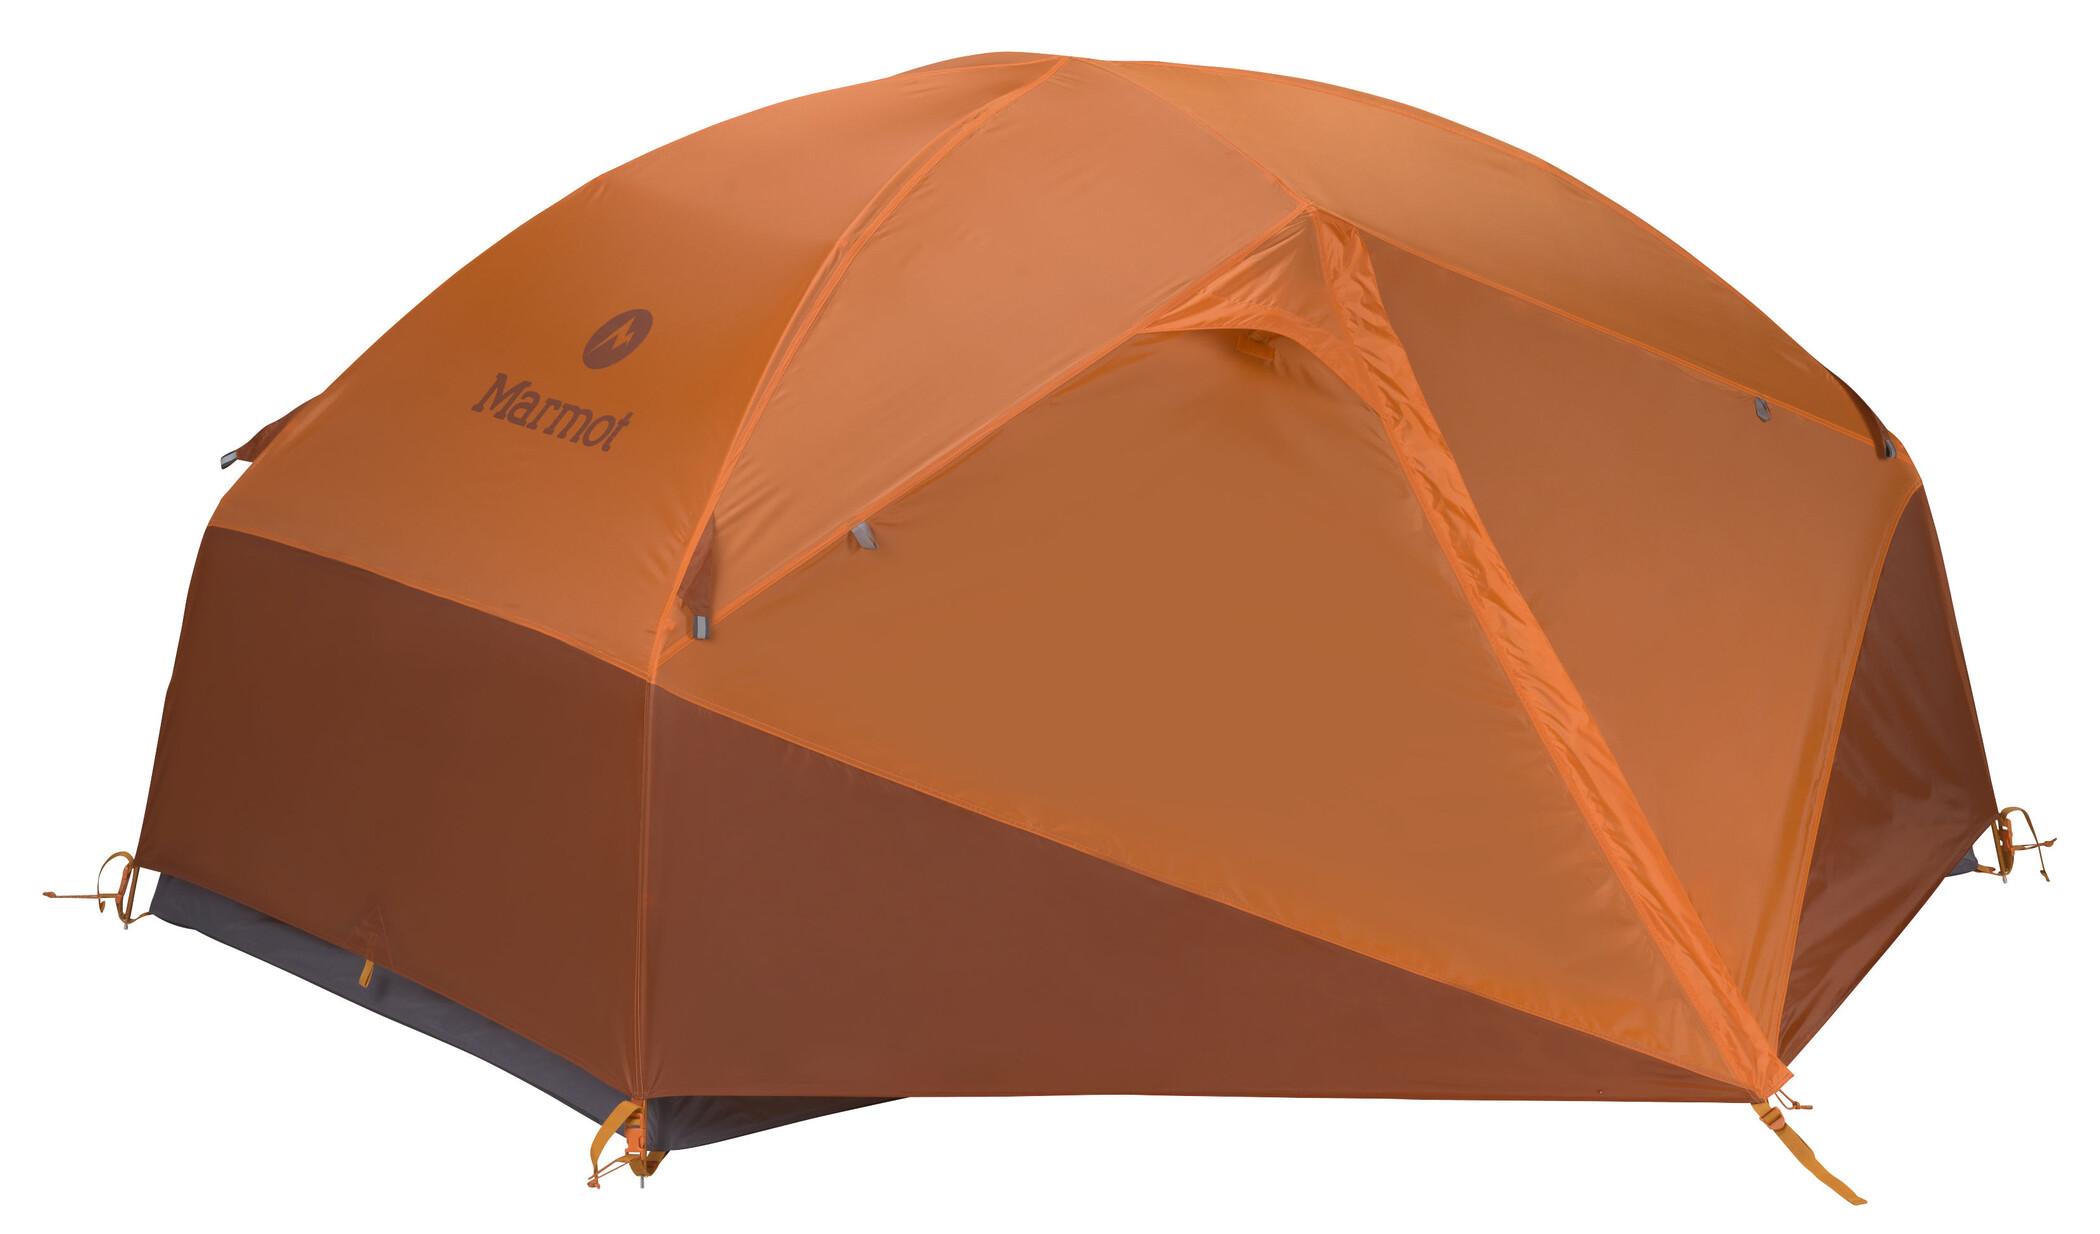 Marmot Mountain Europe GmbH Produkt Kategorien Zelte